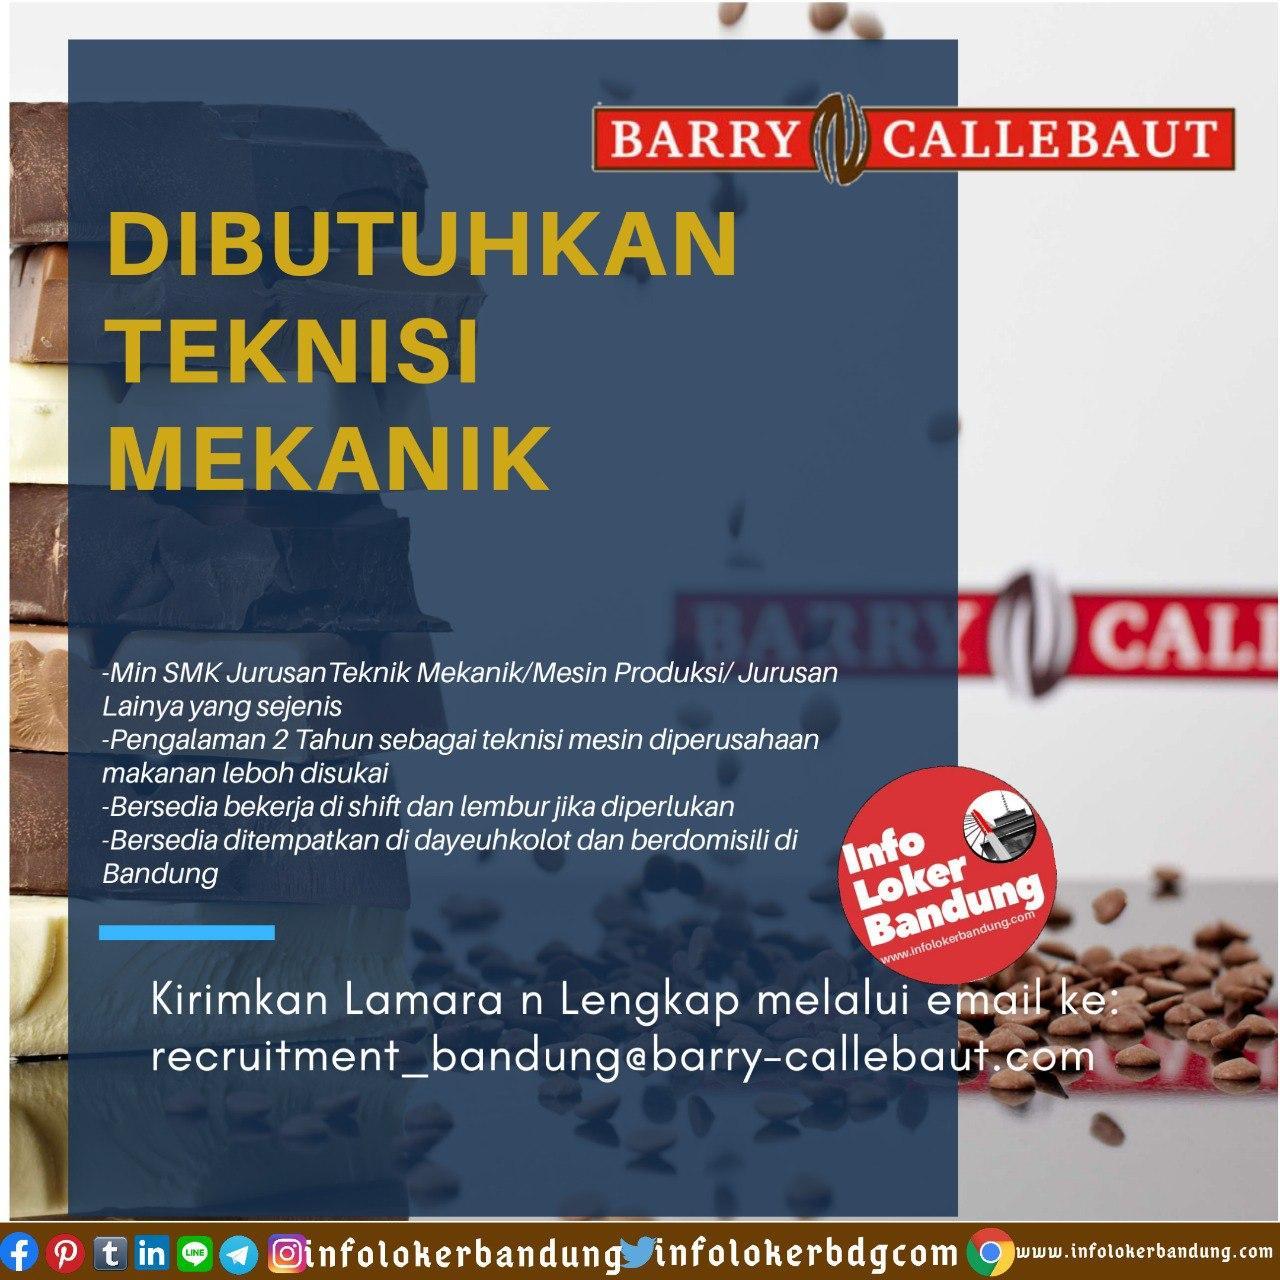 Lowongan Kerja Barry Callebaut Bandung Mei 2020